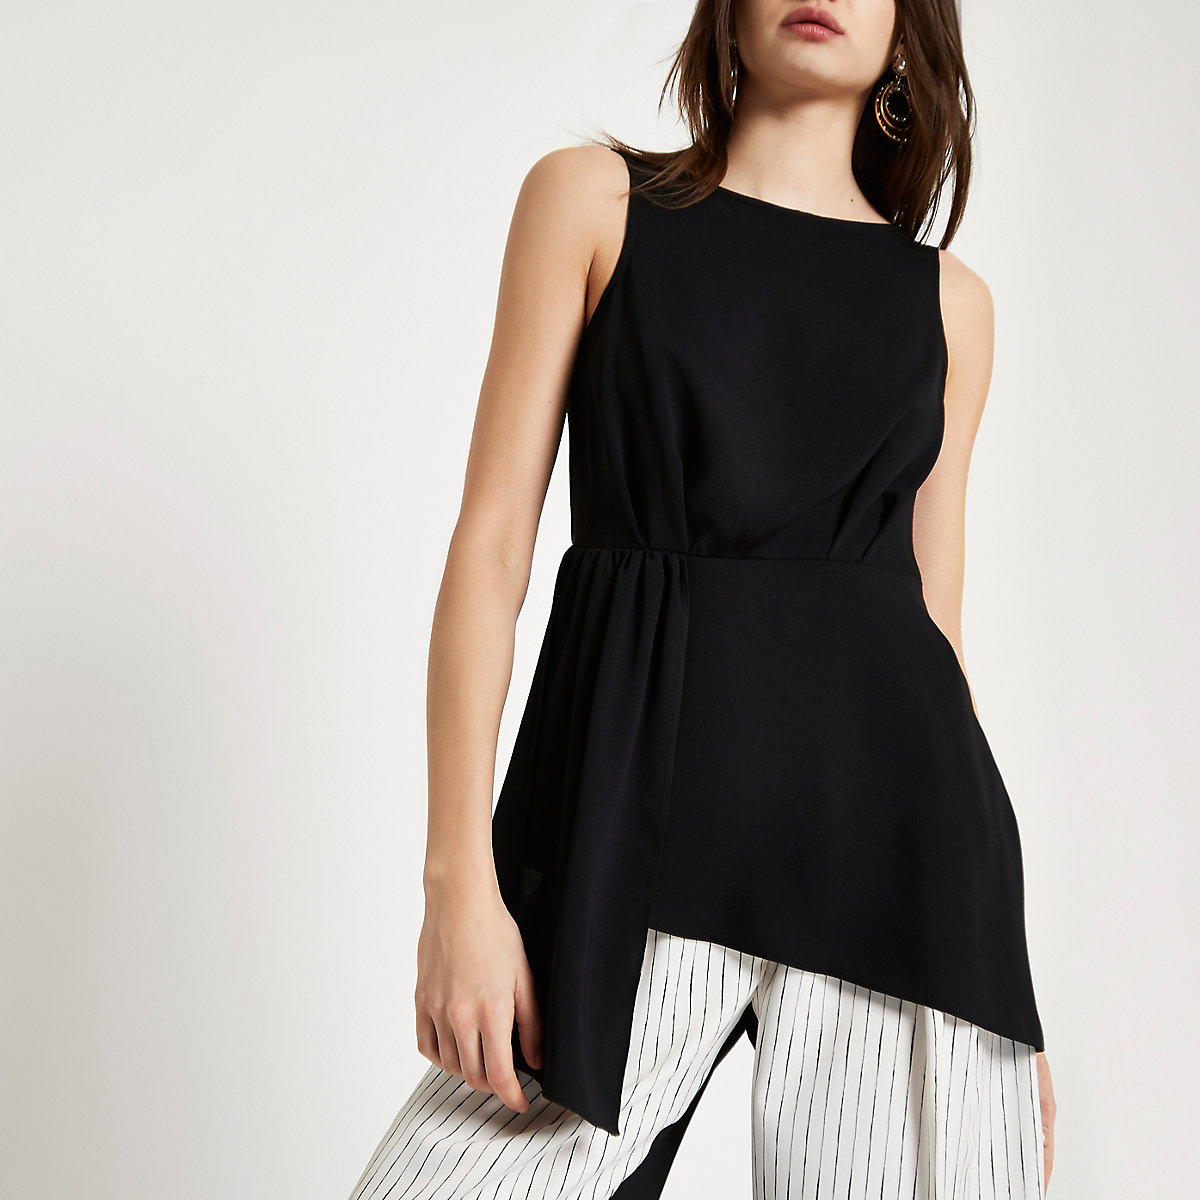 timeless design 2d2b8 9991f Black asymmetric hem sleeveless tunic top